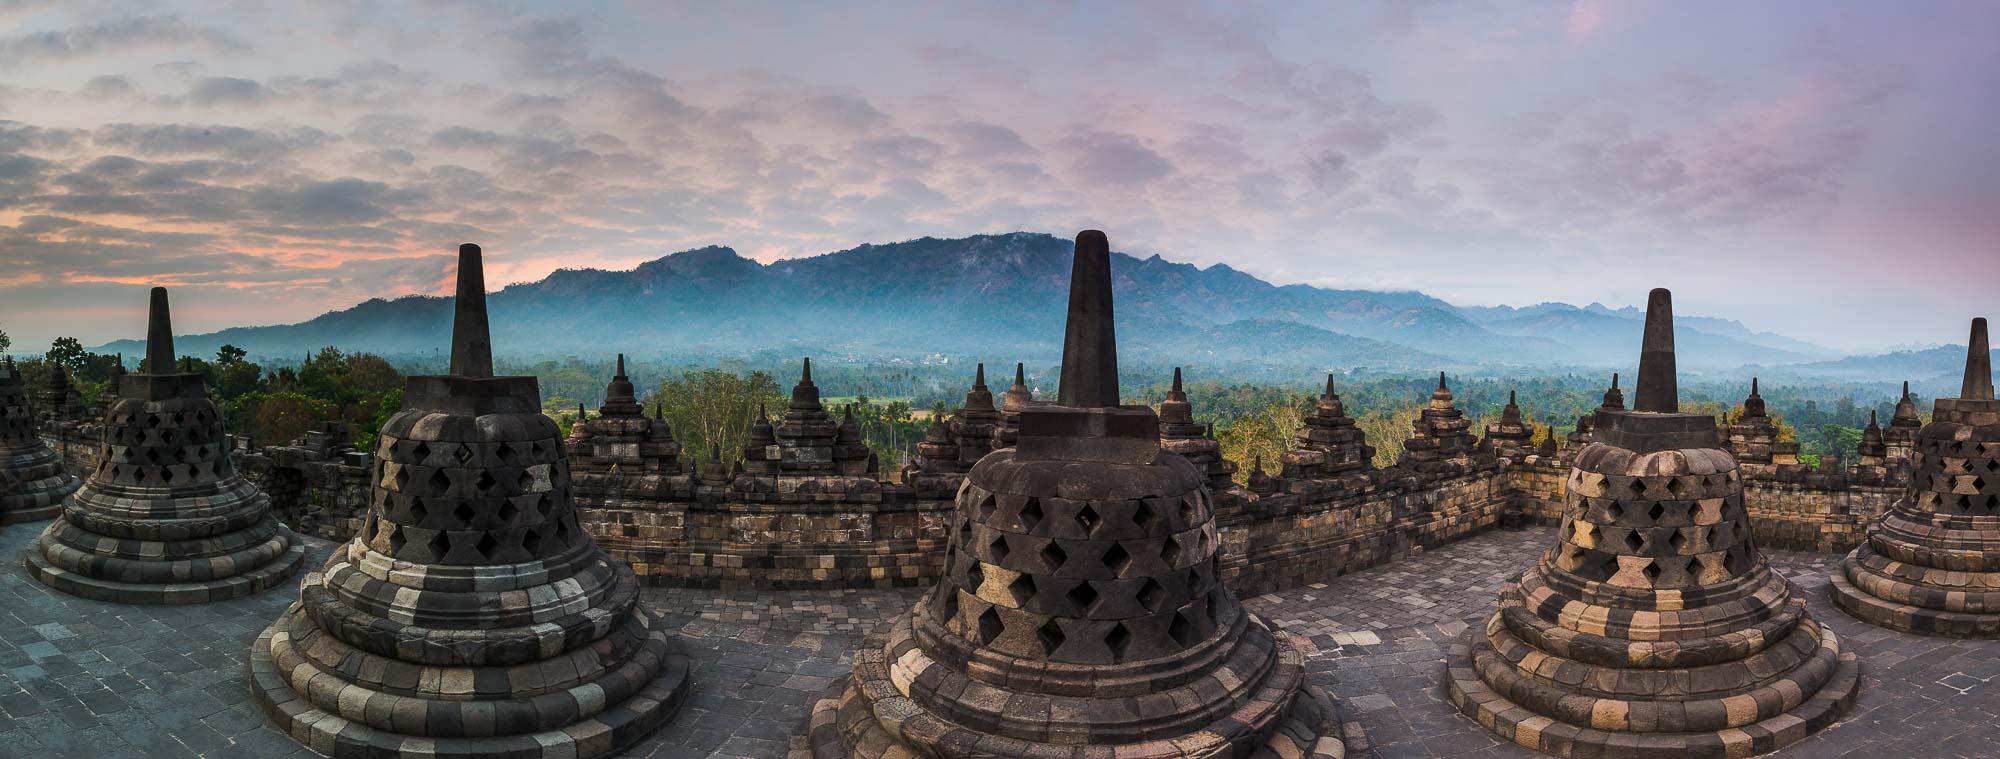 INDONESIA_2015_02 BOROBODUR-PRAMBANAN-YOGYA_JusMedic_116-Pano-Edit